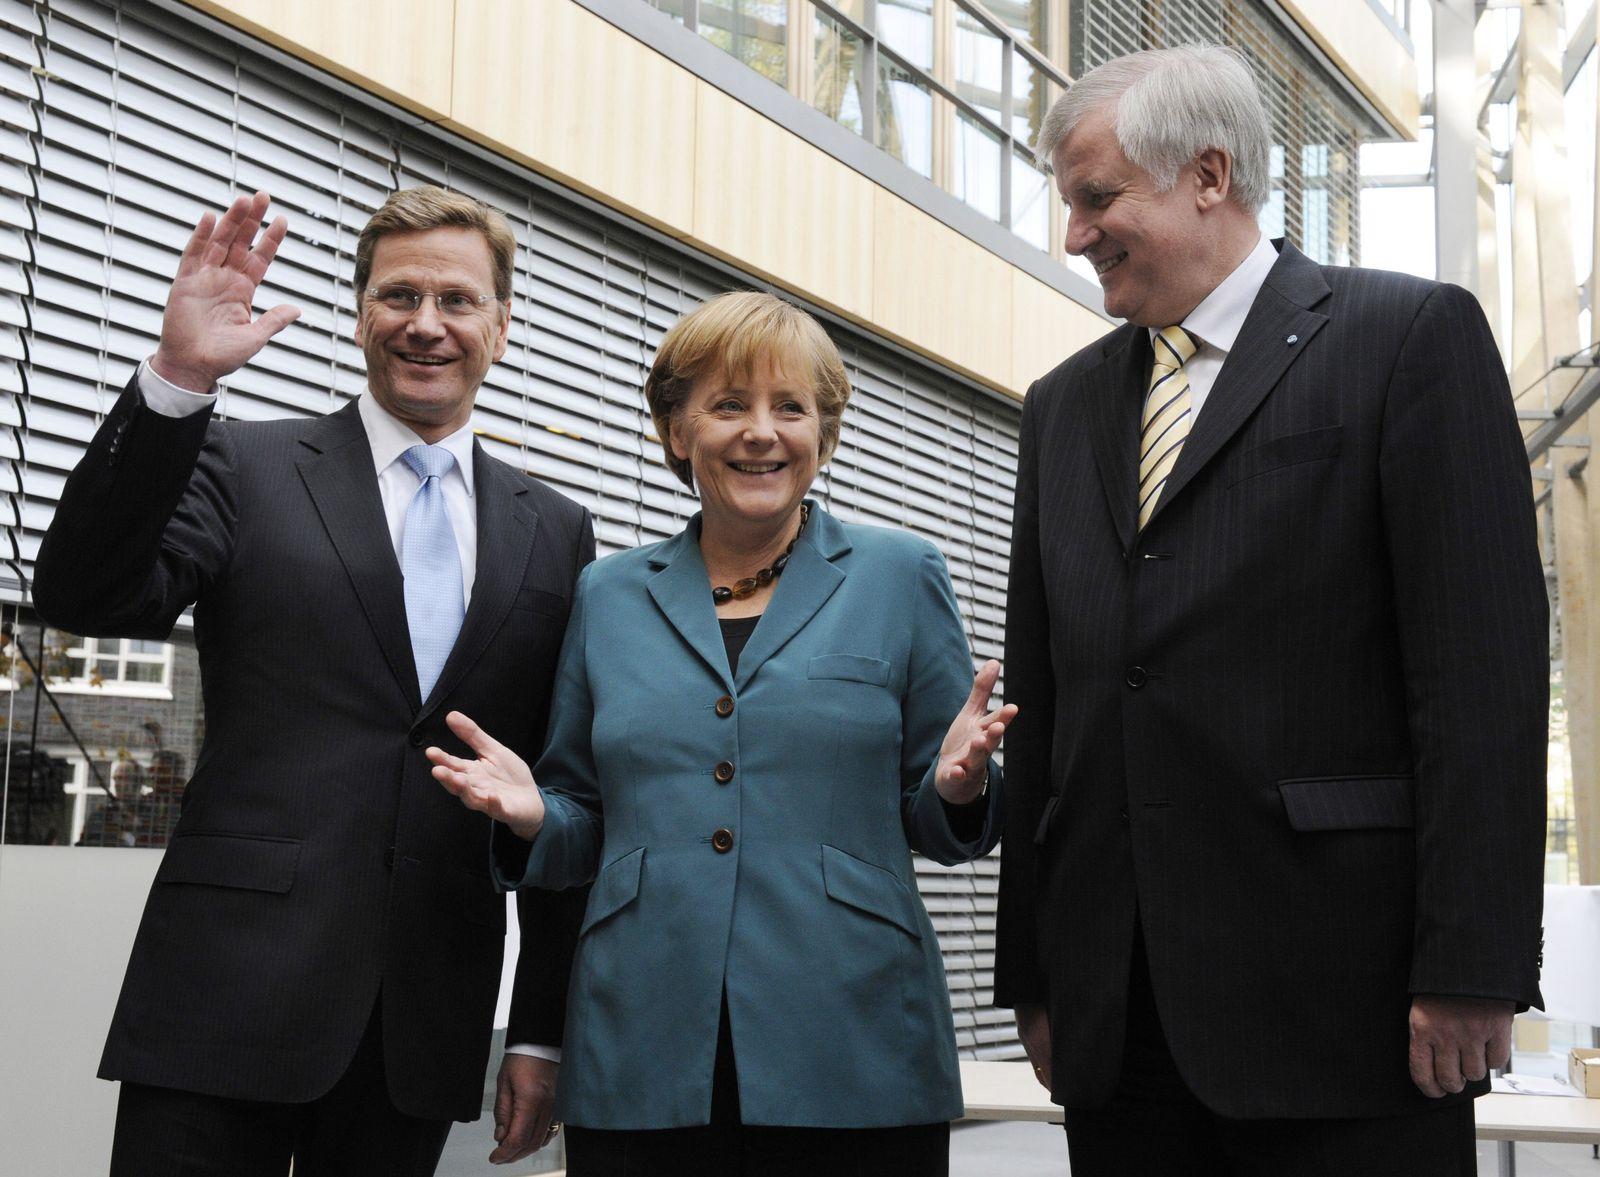 Westerwelle/ Merkel/ Seehofer